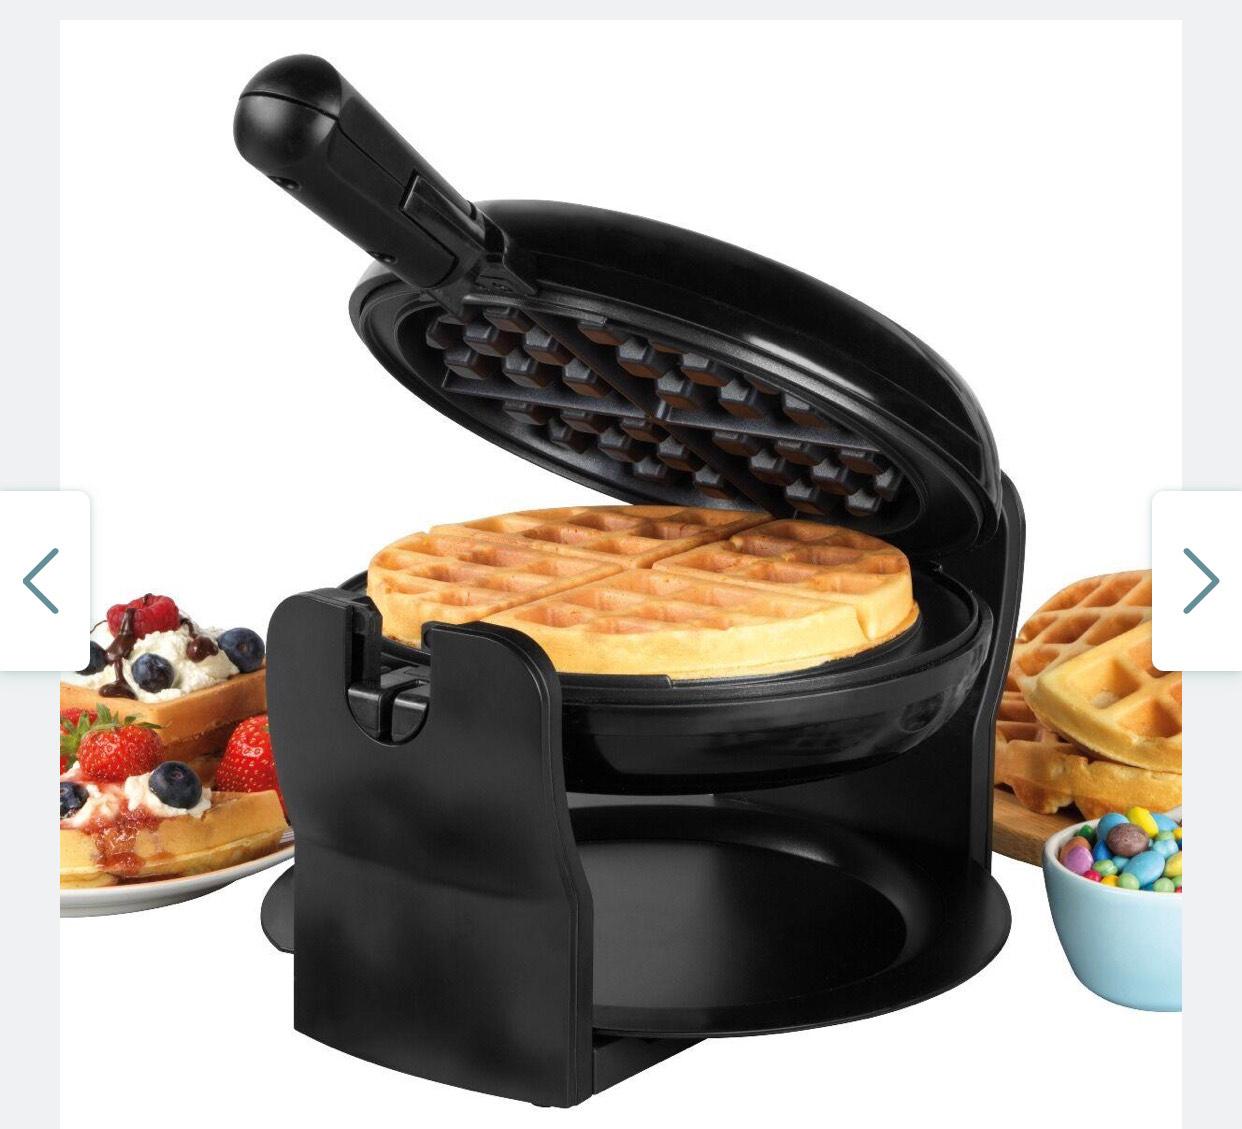 Progress EK4376P 1000W Rotary Non- Stick Waffle Maker - Black £39.99 delivered @ Robert Dyas